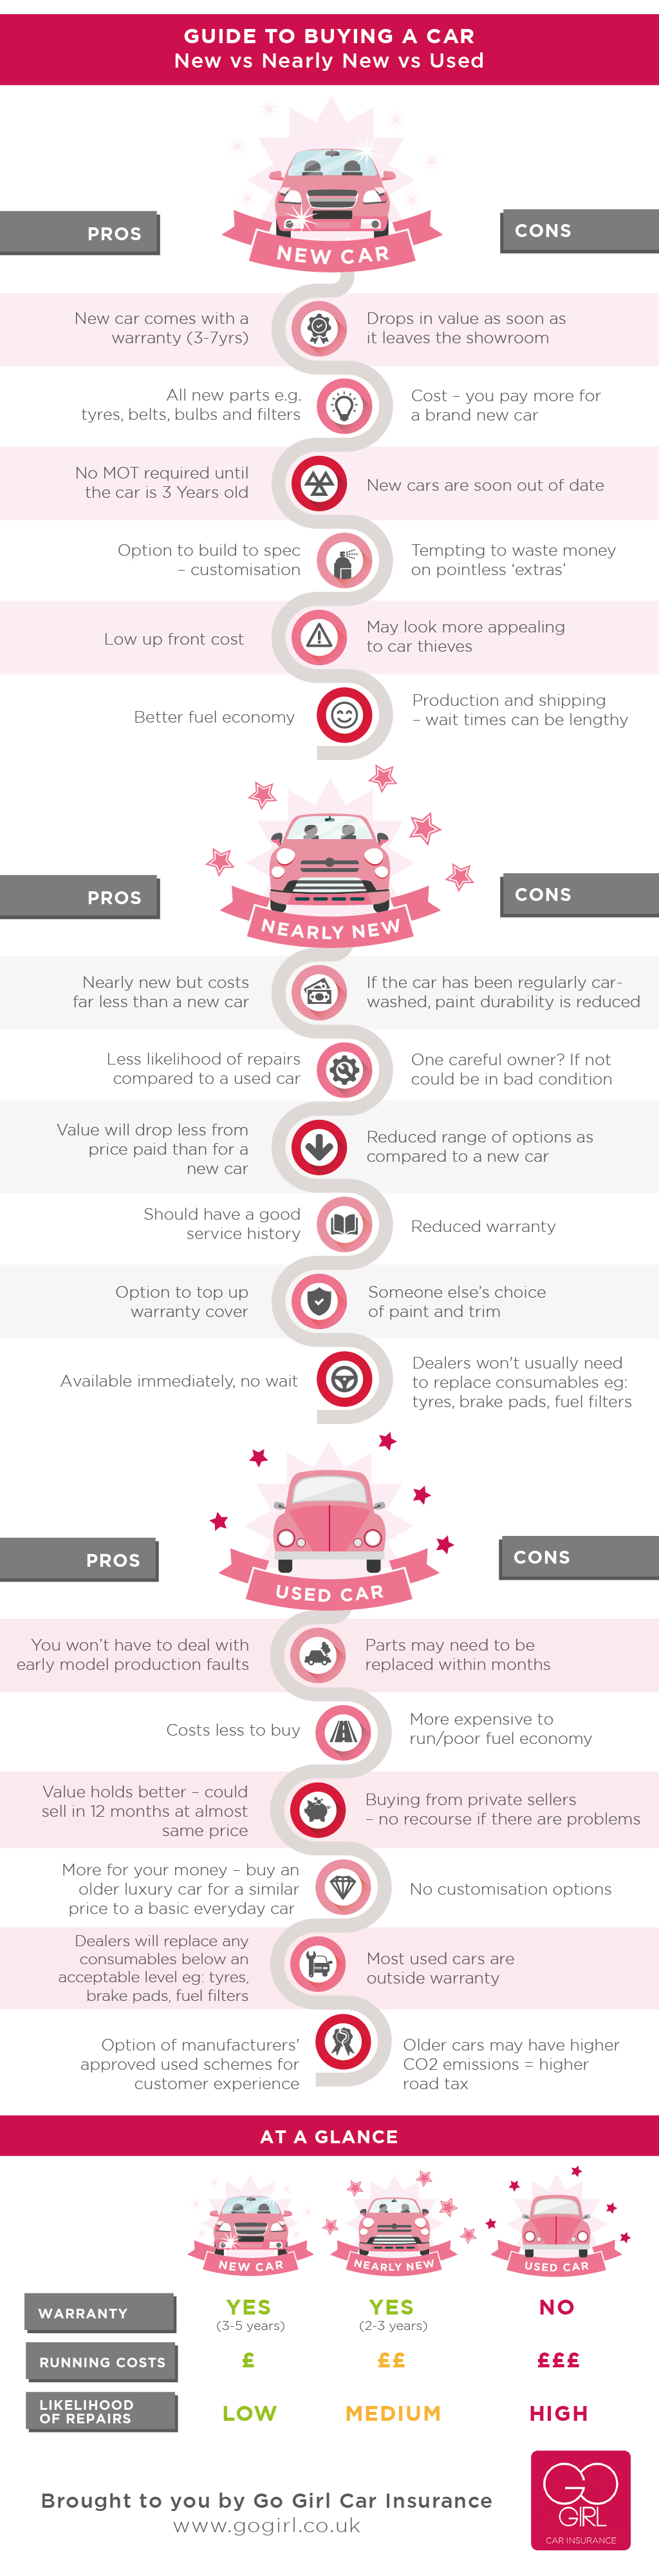 Go Girl Car Insurance New Car v Nearly New Car v Used Car